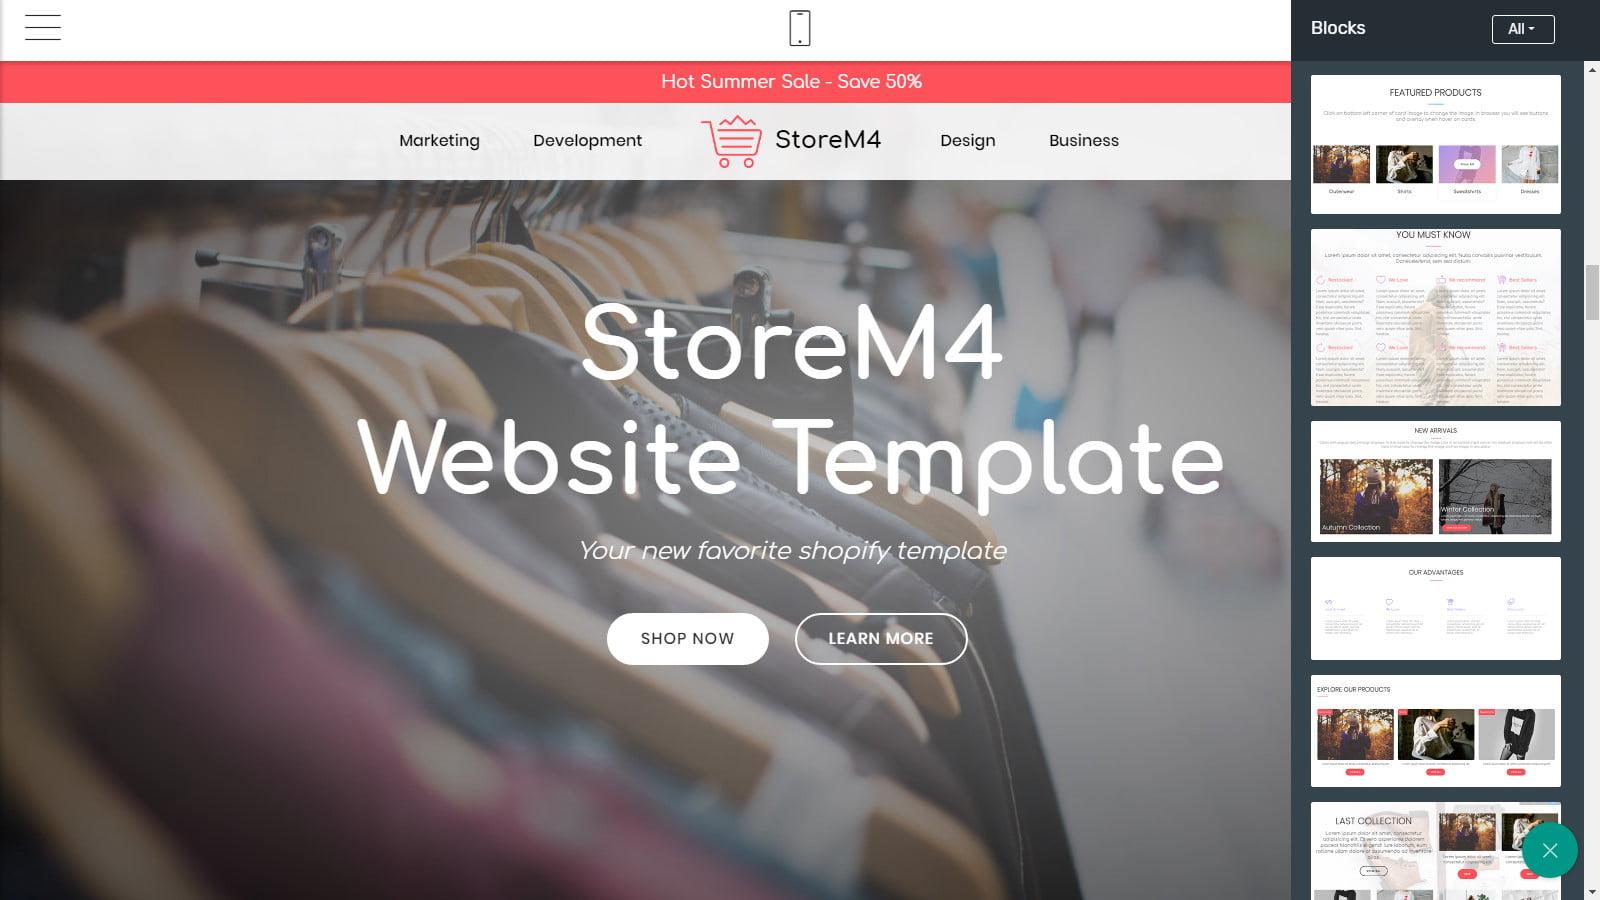 storem4 - 62+ Best Free HTML5 Website Templates 2019